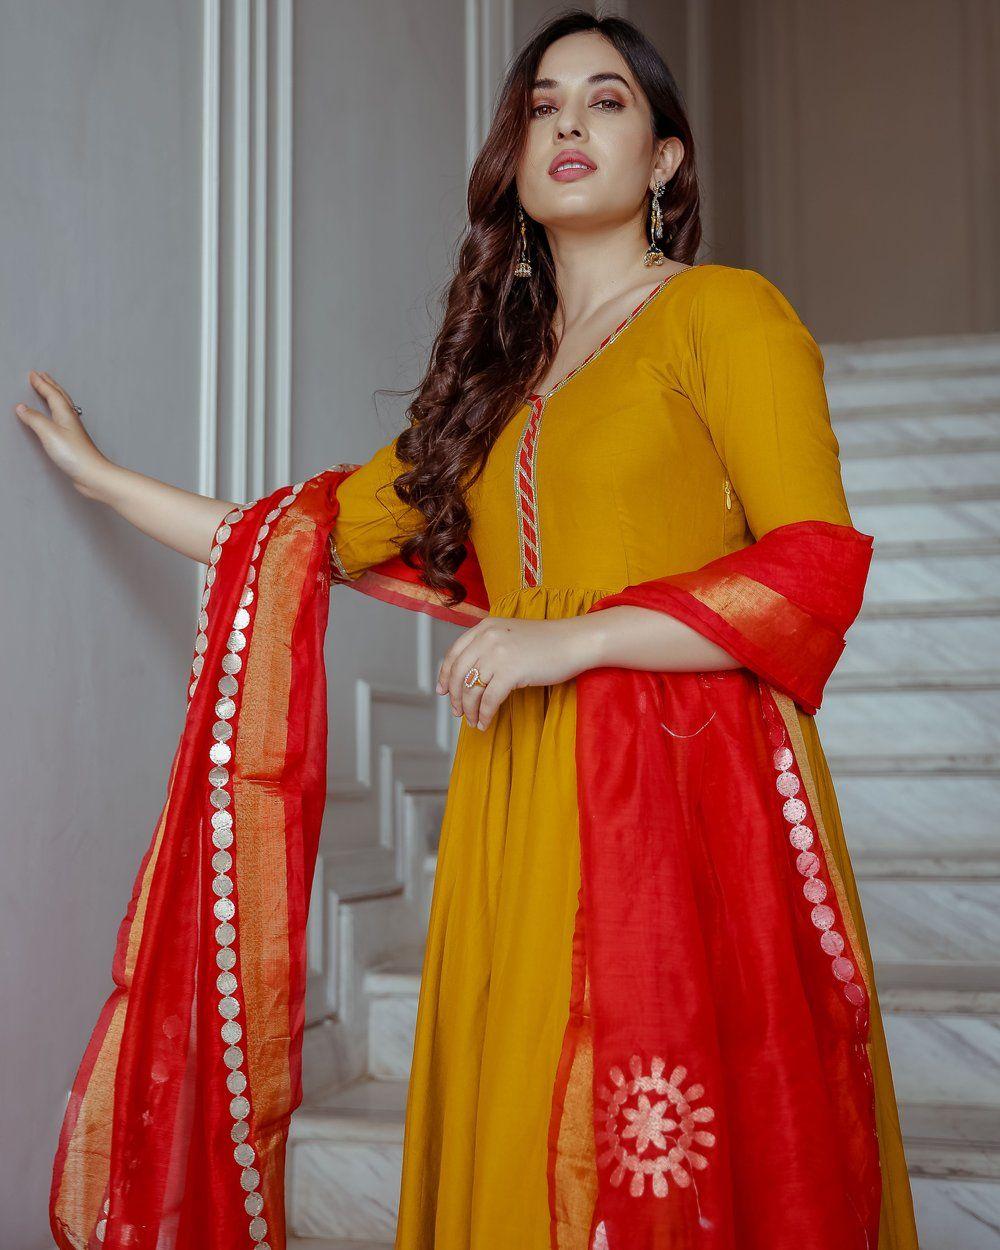 Black Dress Anniversary Gift For Wife Latest Beautiful Anarkali Kurti With Pant Rayon Anarkali Kurti With Pant Red Color Beautiful Dress